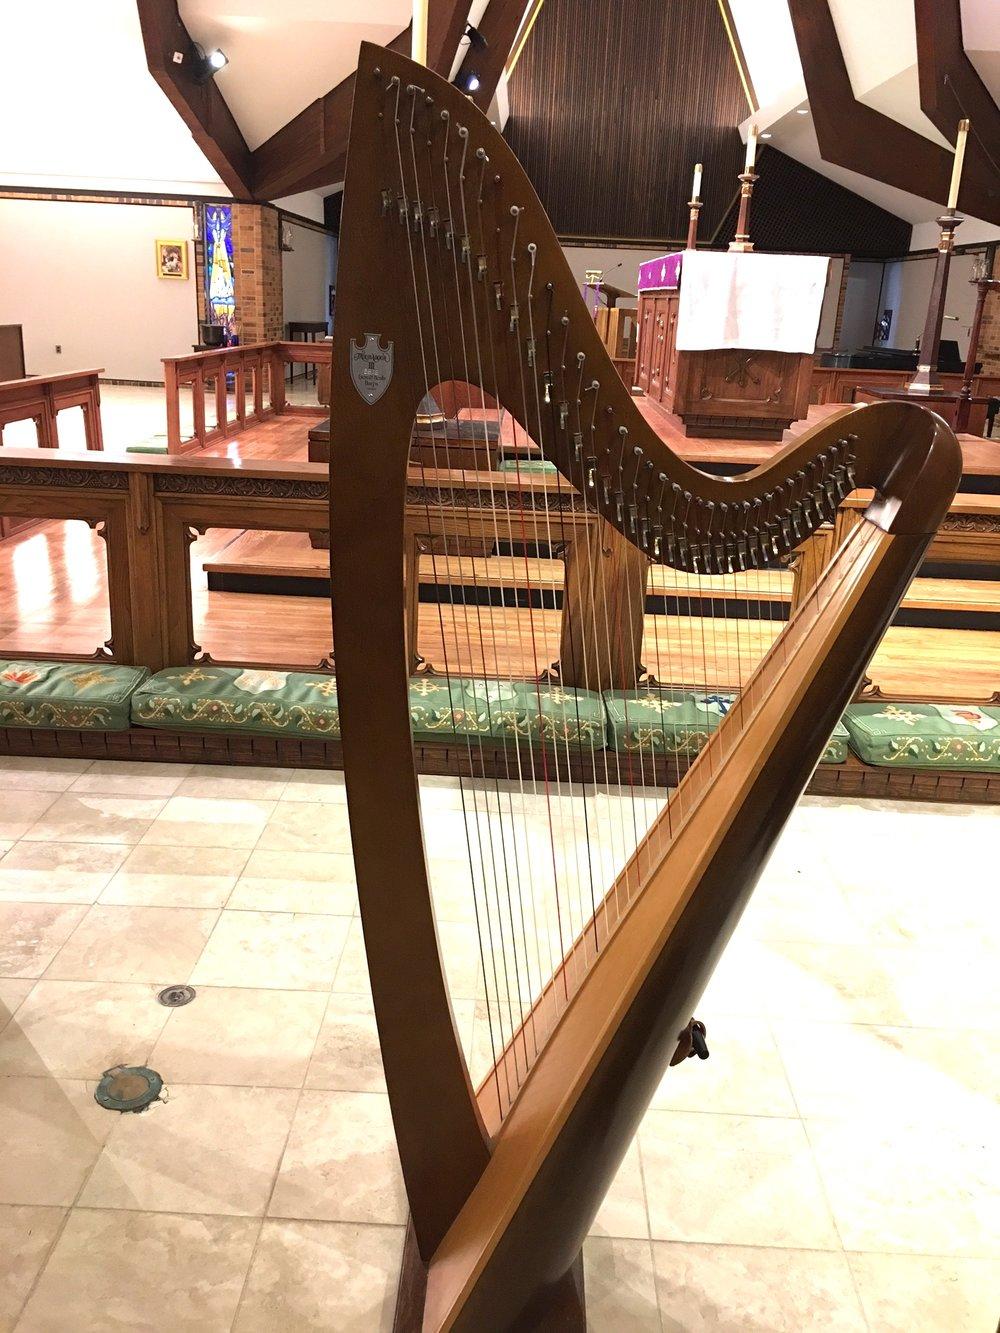 Harp at St. Mark's